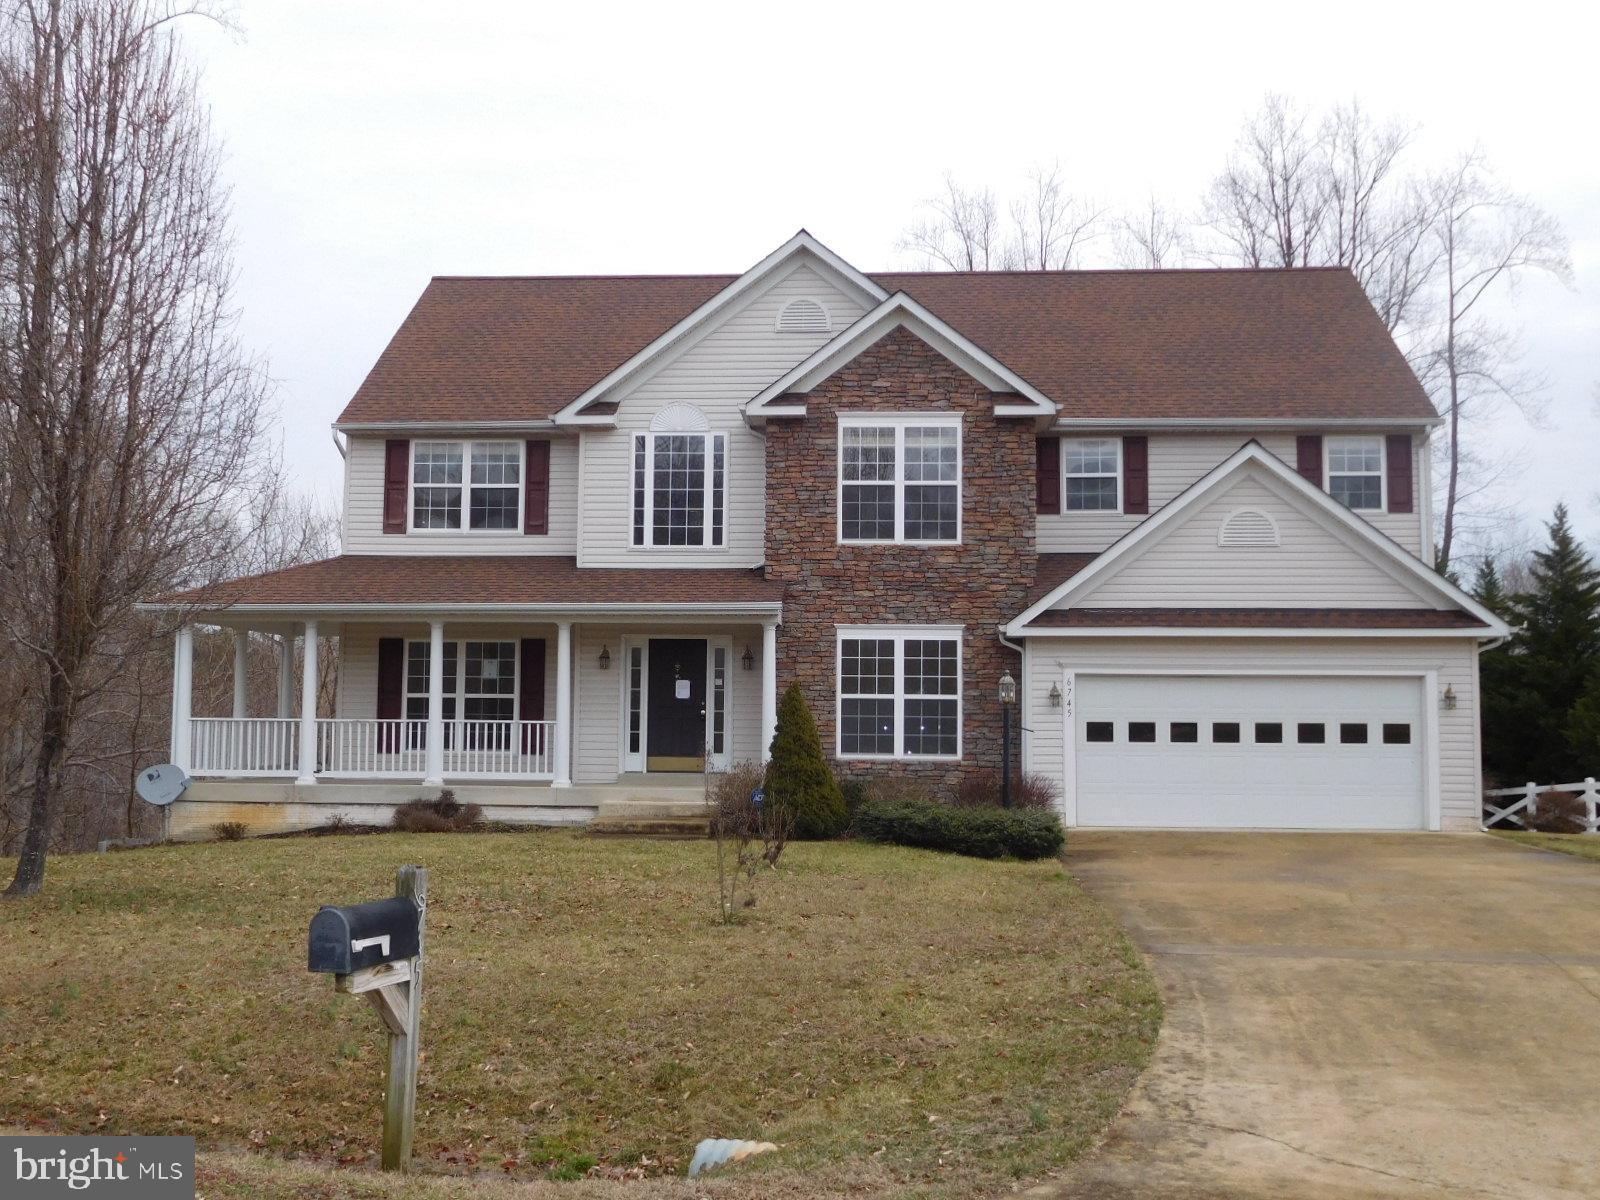 6745 N Stuart Rd, King George, VA, 22485